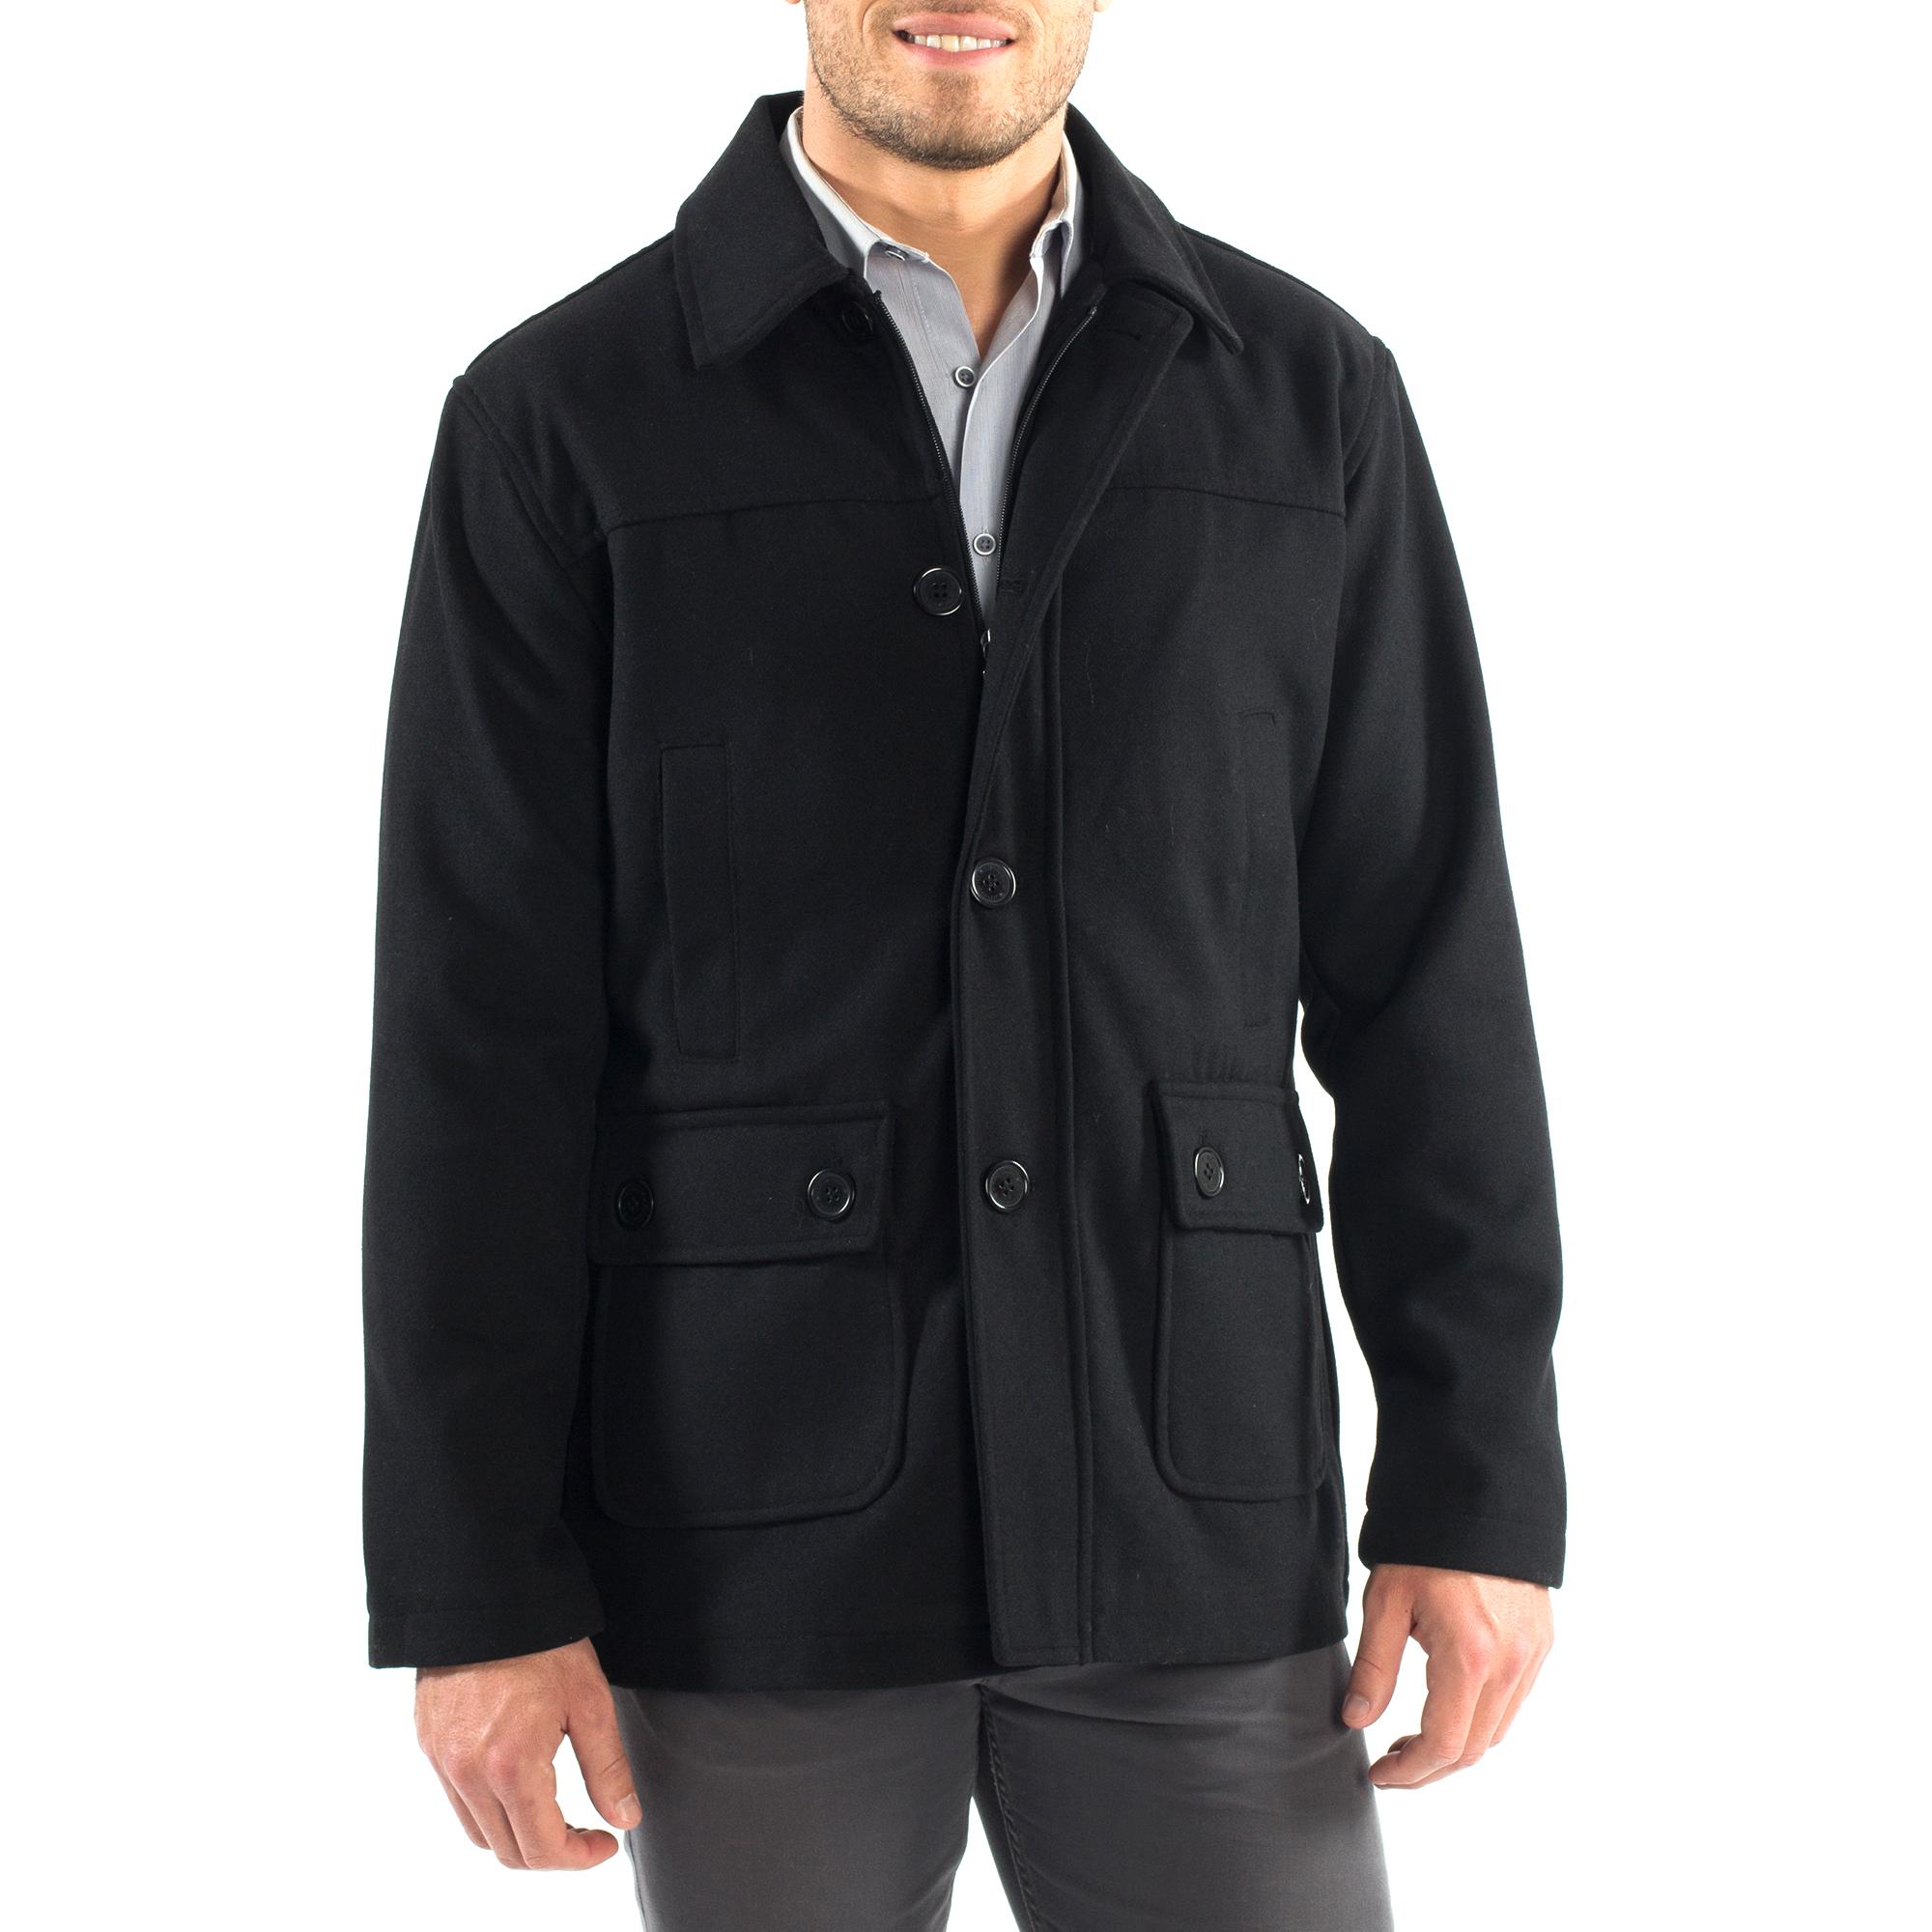 Alpine Swiss Wyat Mens Wool Blend Classic Barn Coat Cargo Pocket Military Jacket